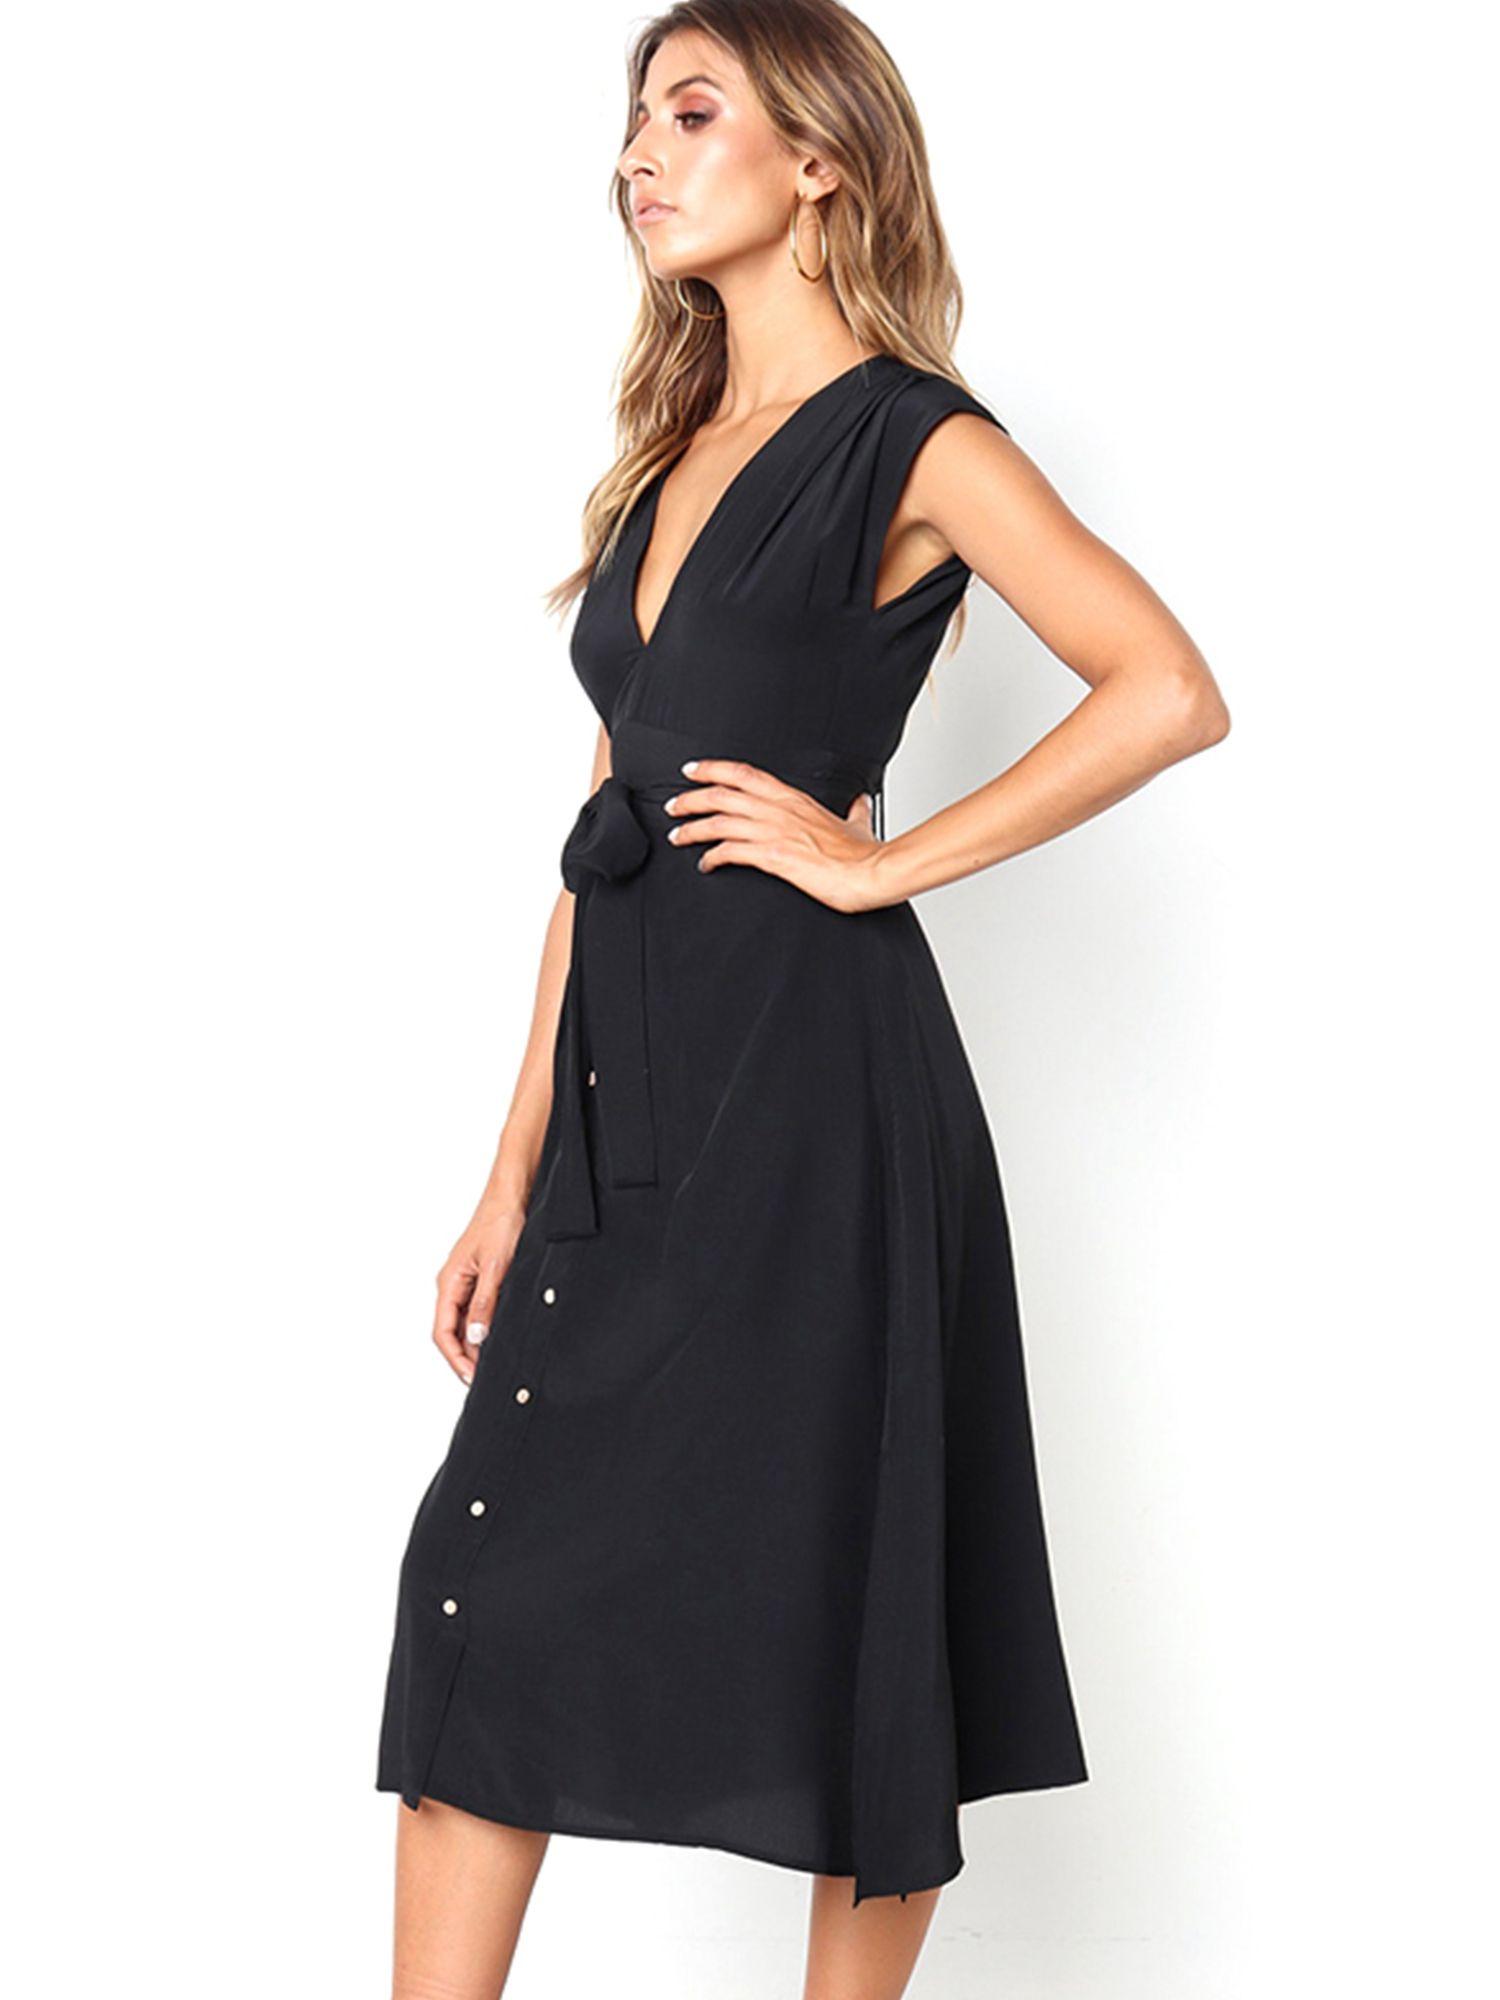 Wodstyle Llc Women S Sleeveless V Neck Casual Party Beach Midi Dress Walmart Com Walmart Com Midi Dress Dresses Boho Dresses Long [ 2000 x 1500 Pixel ]